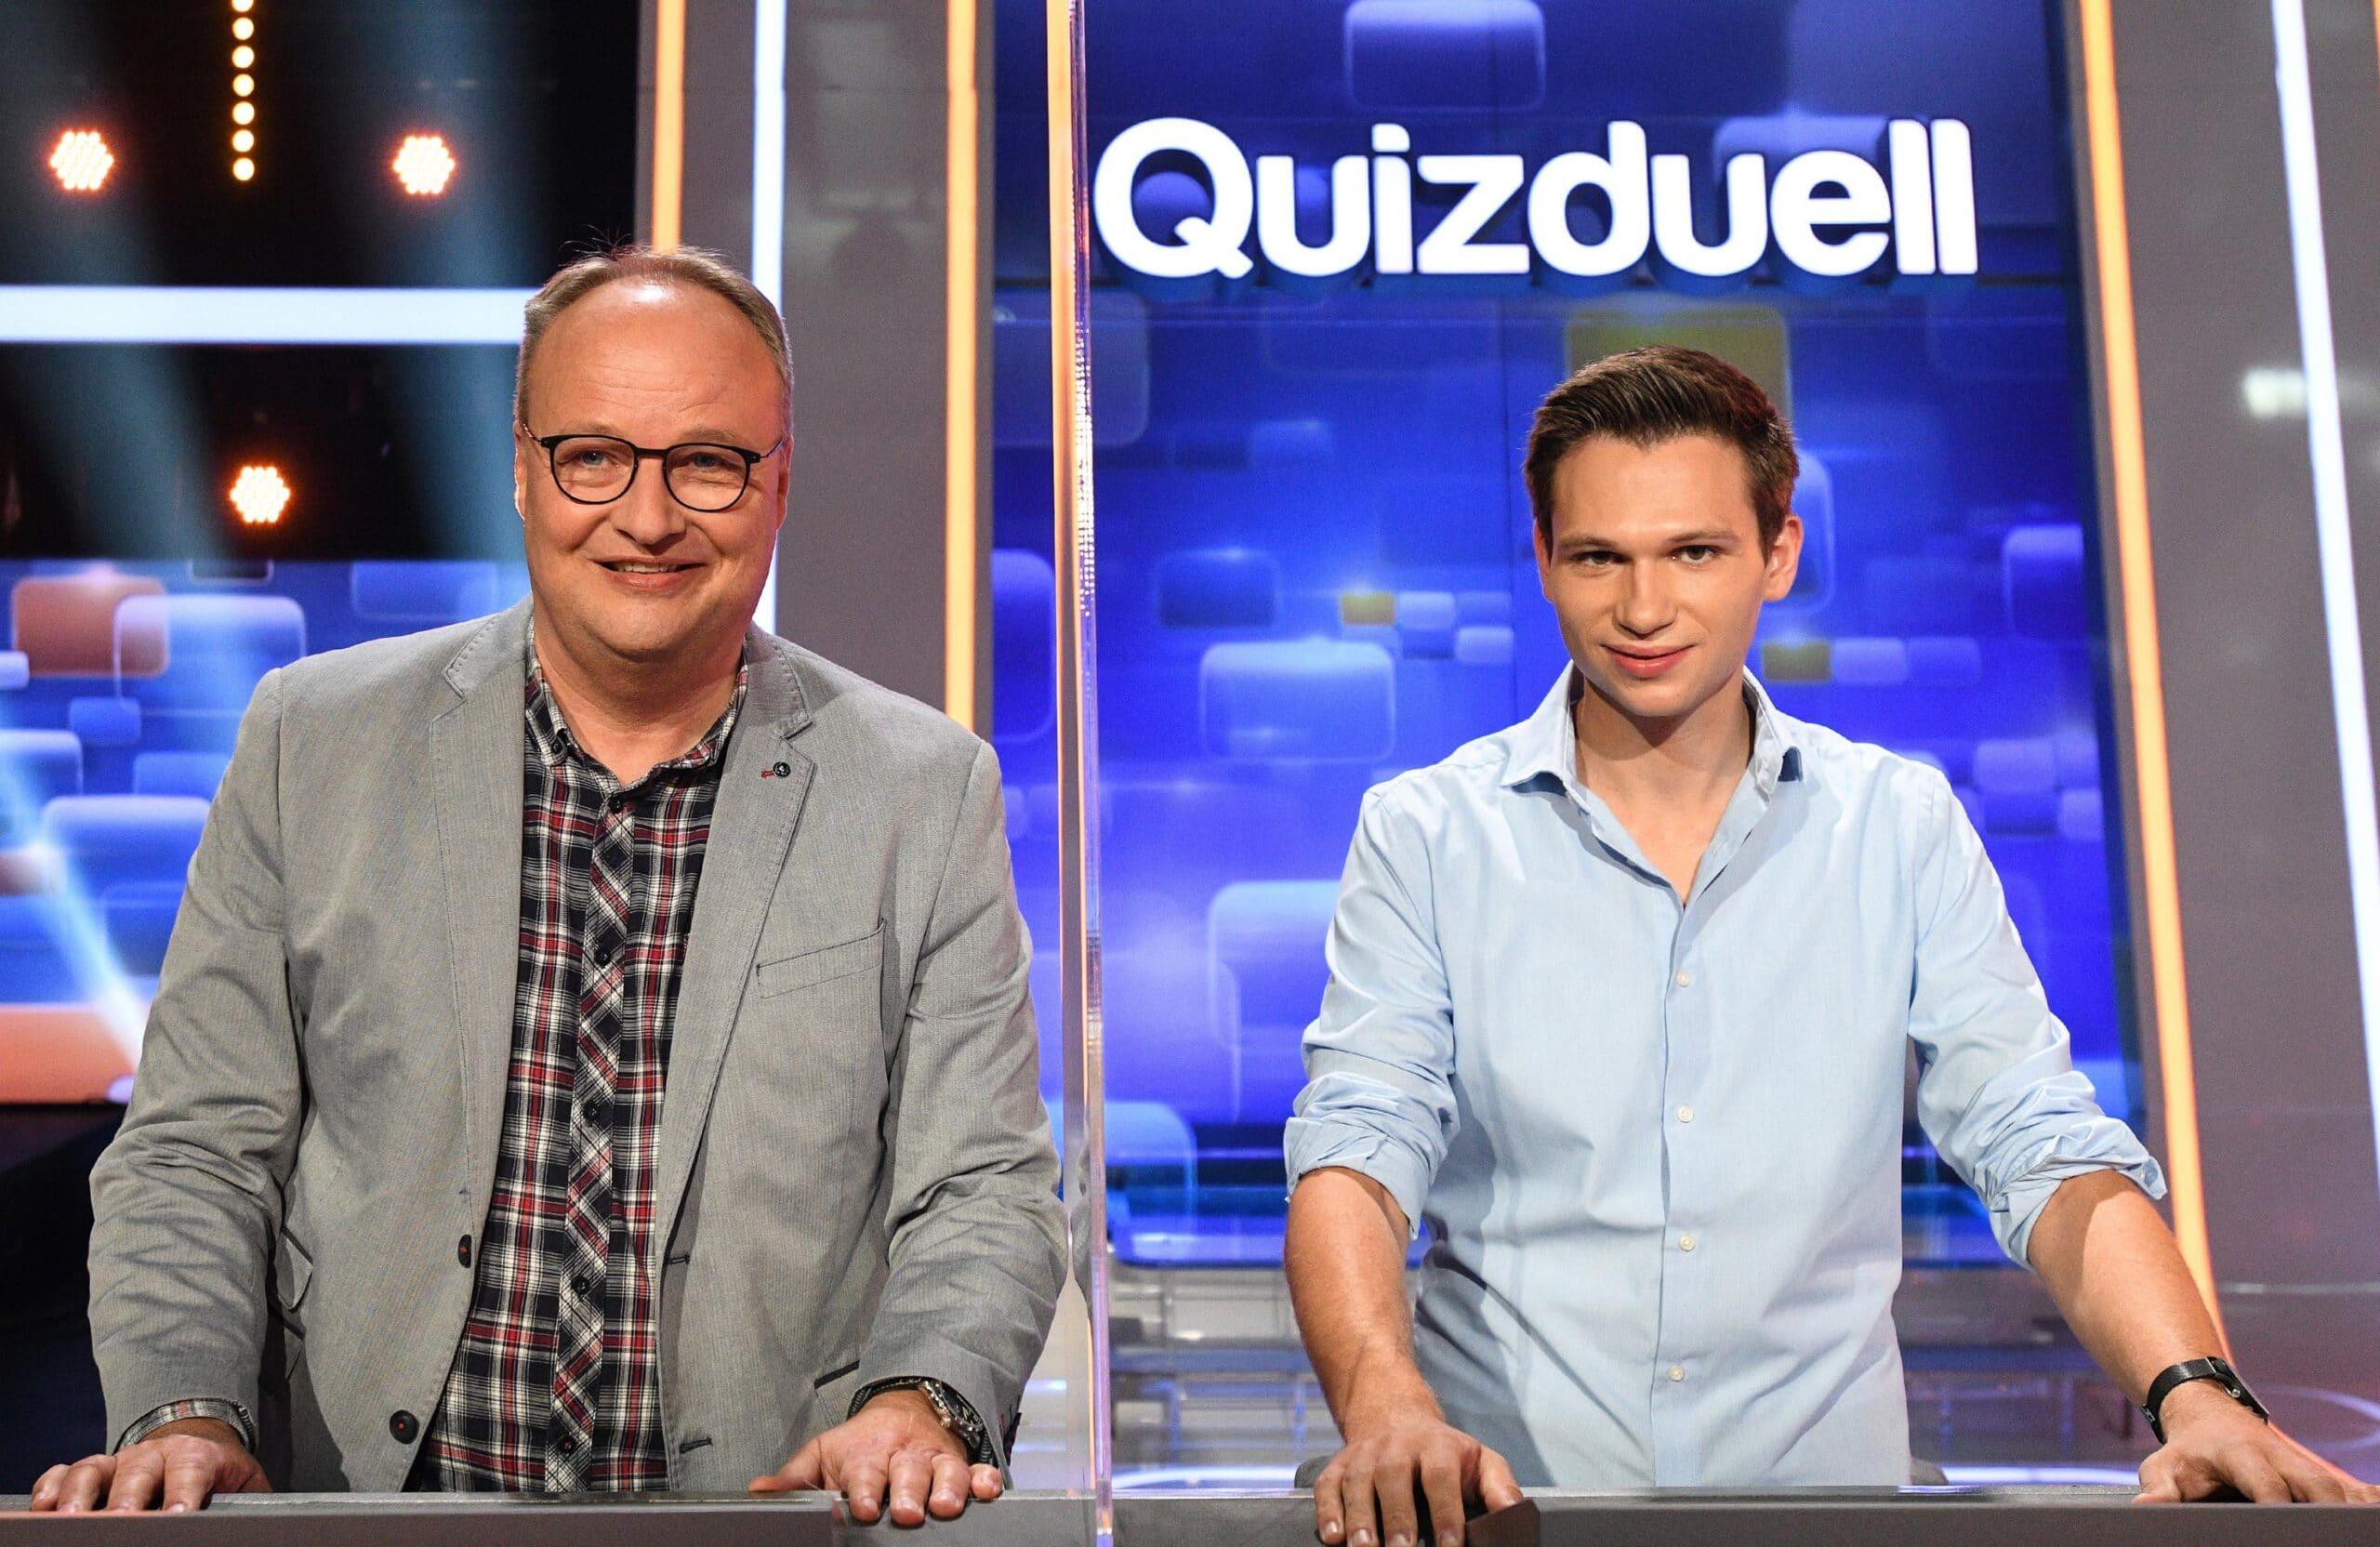 Oliver Welke und Fabian Köster Quizduell-Olymp, Folge 331